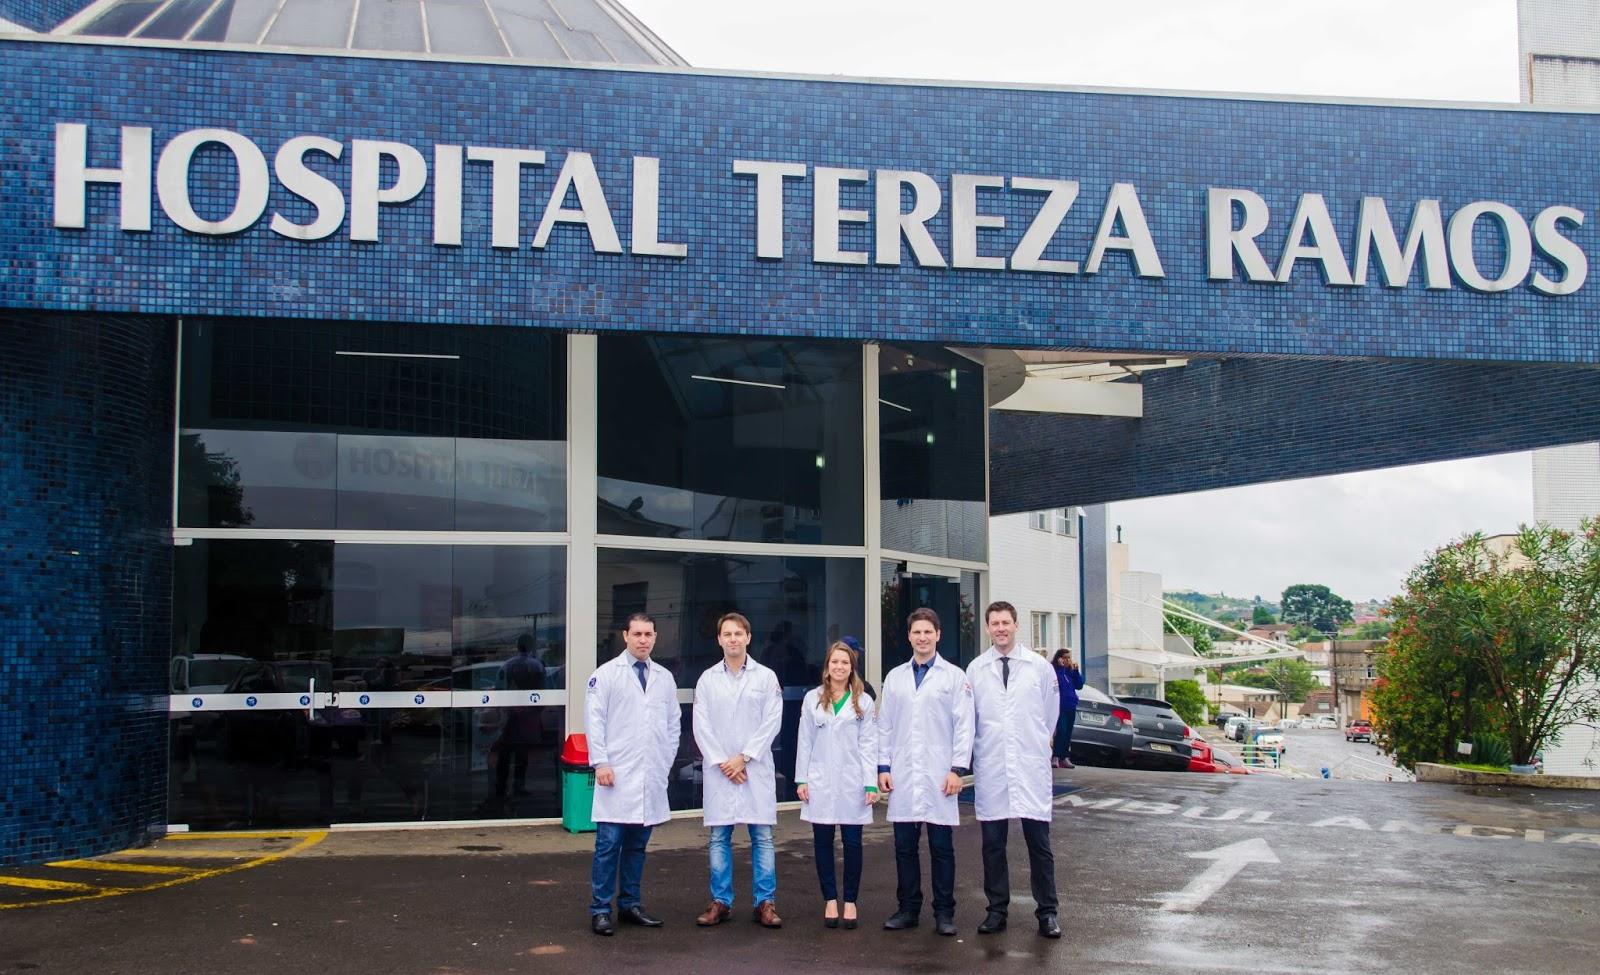 hospital tereza ramos lages fotos